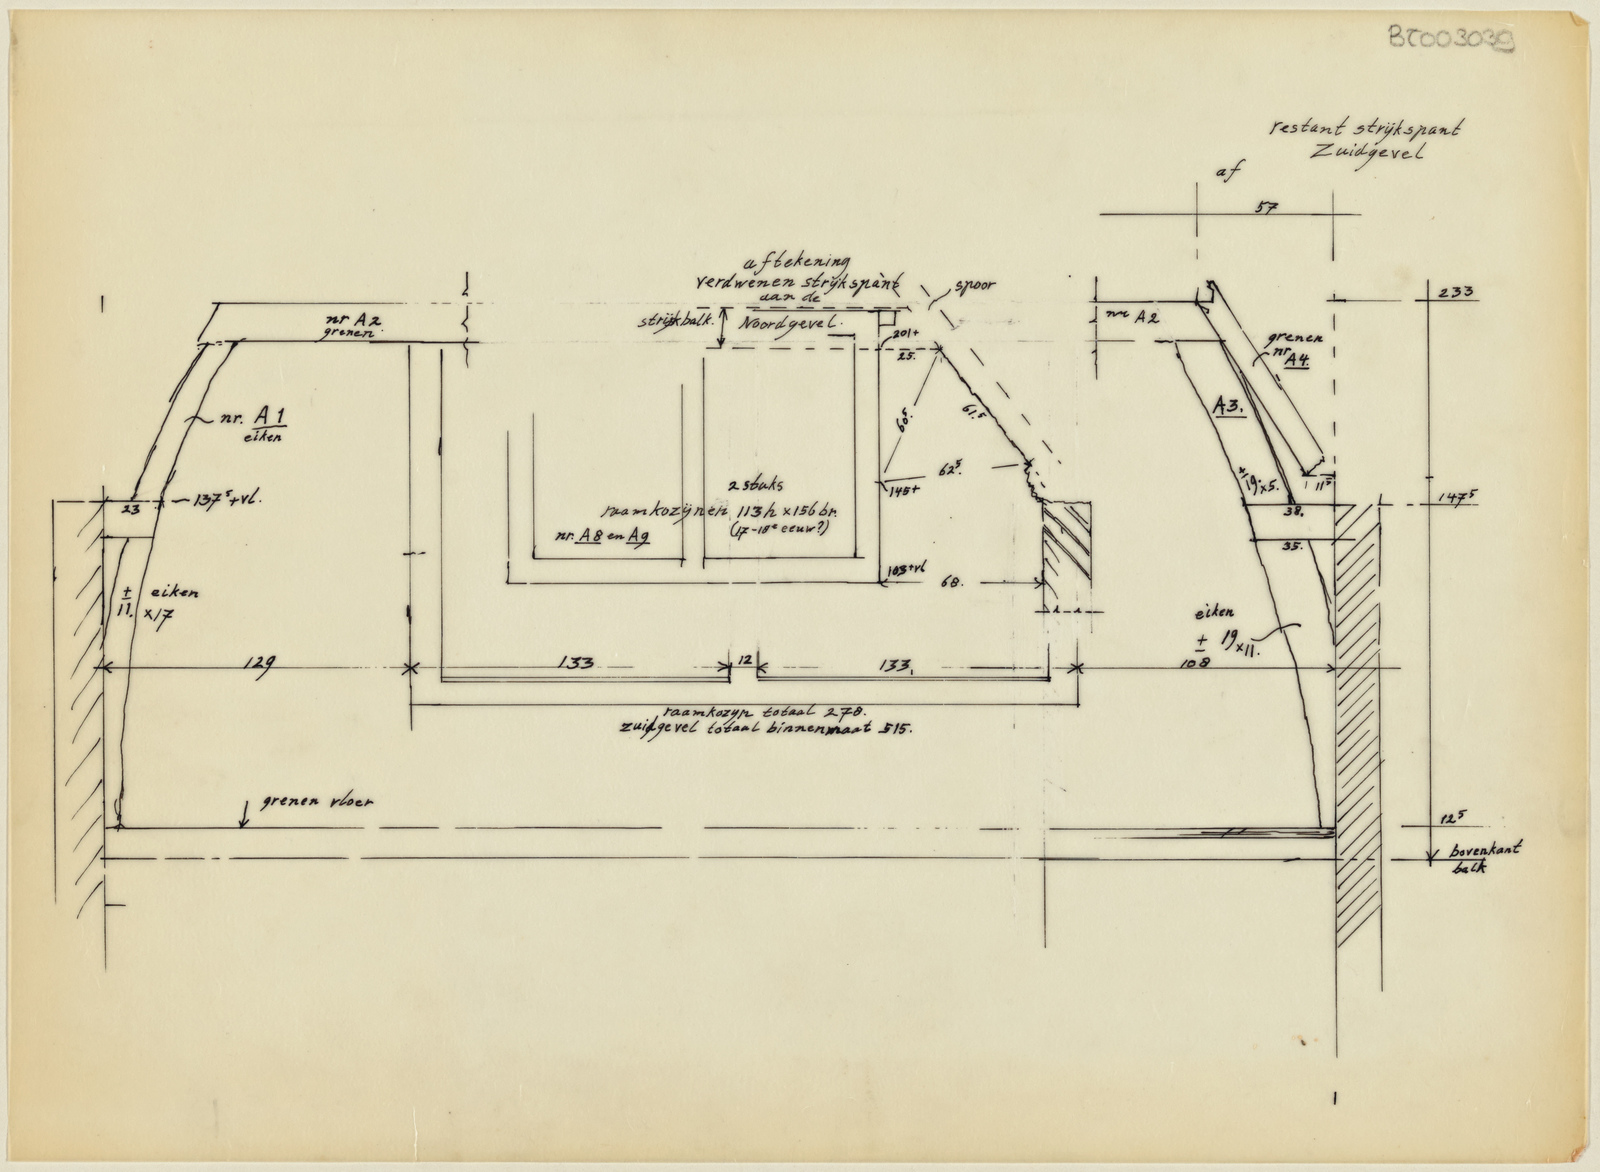 Schets restant strijkspant Zuidgevel, onbekend pand